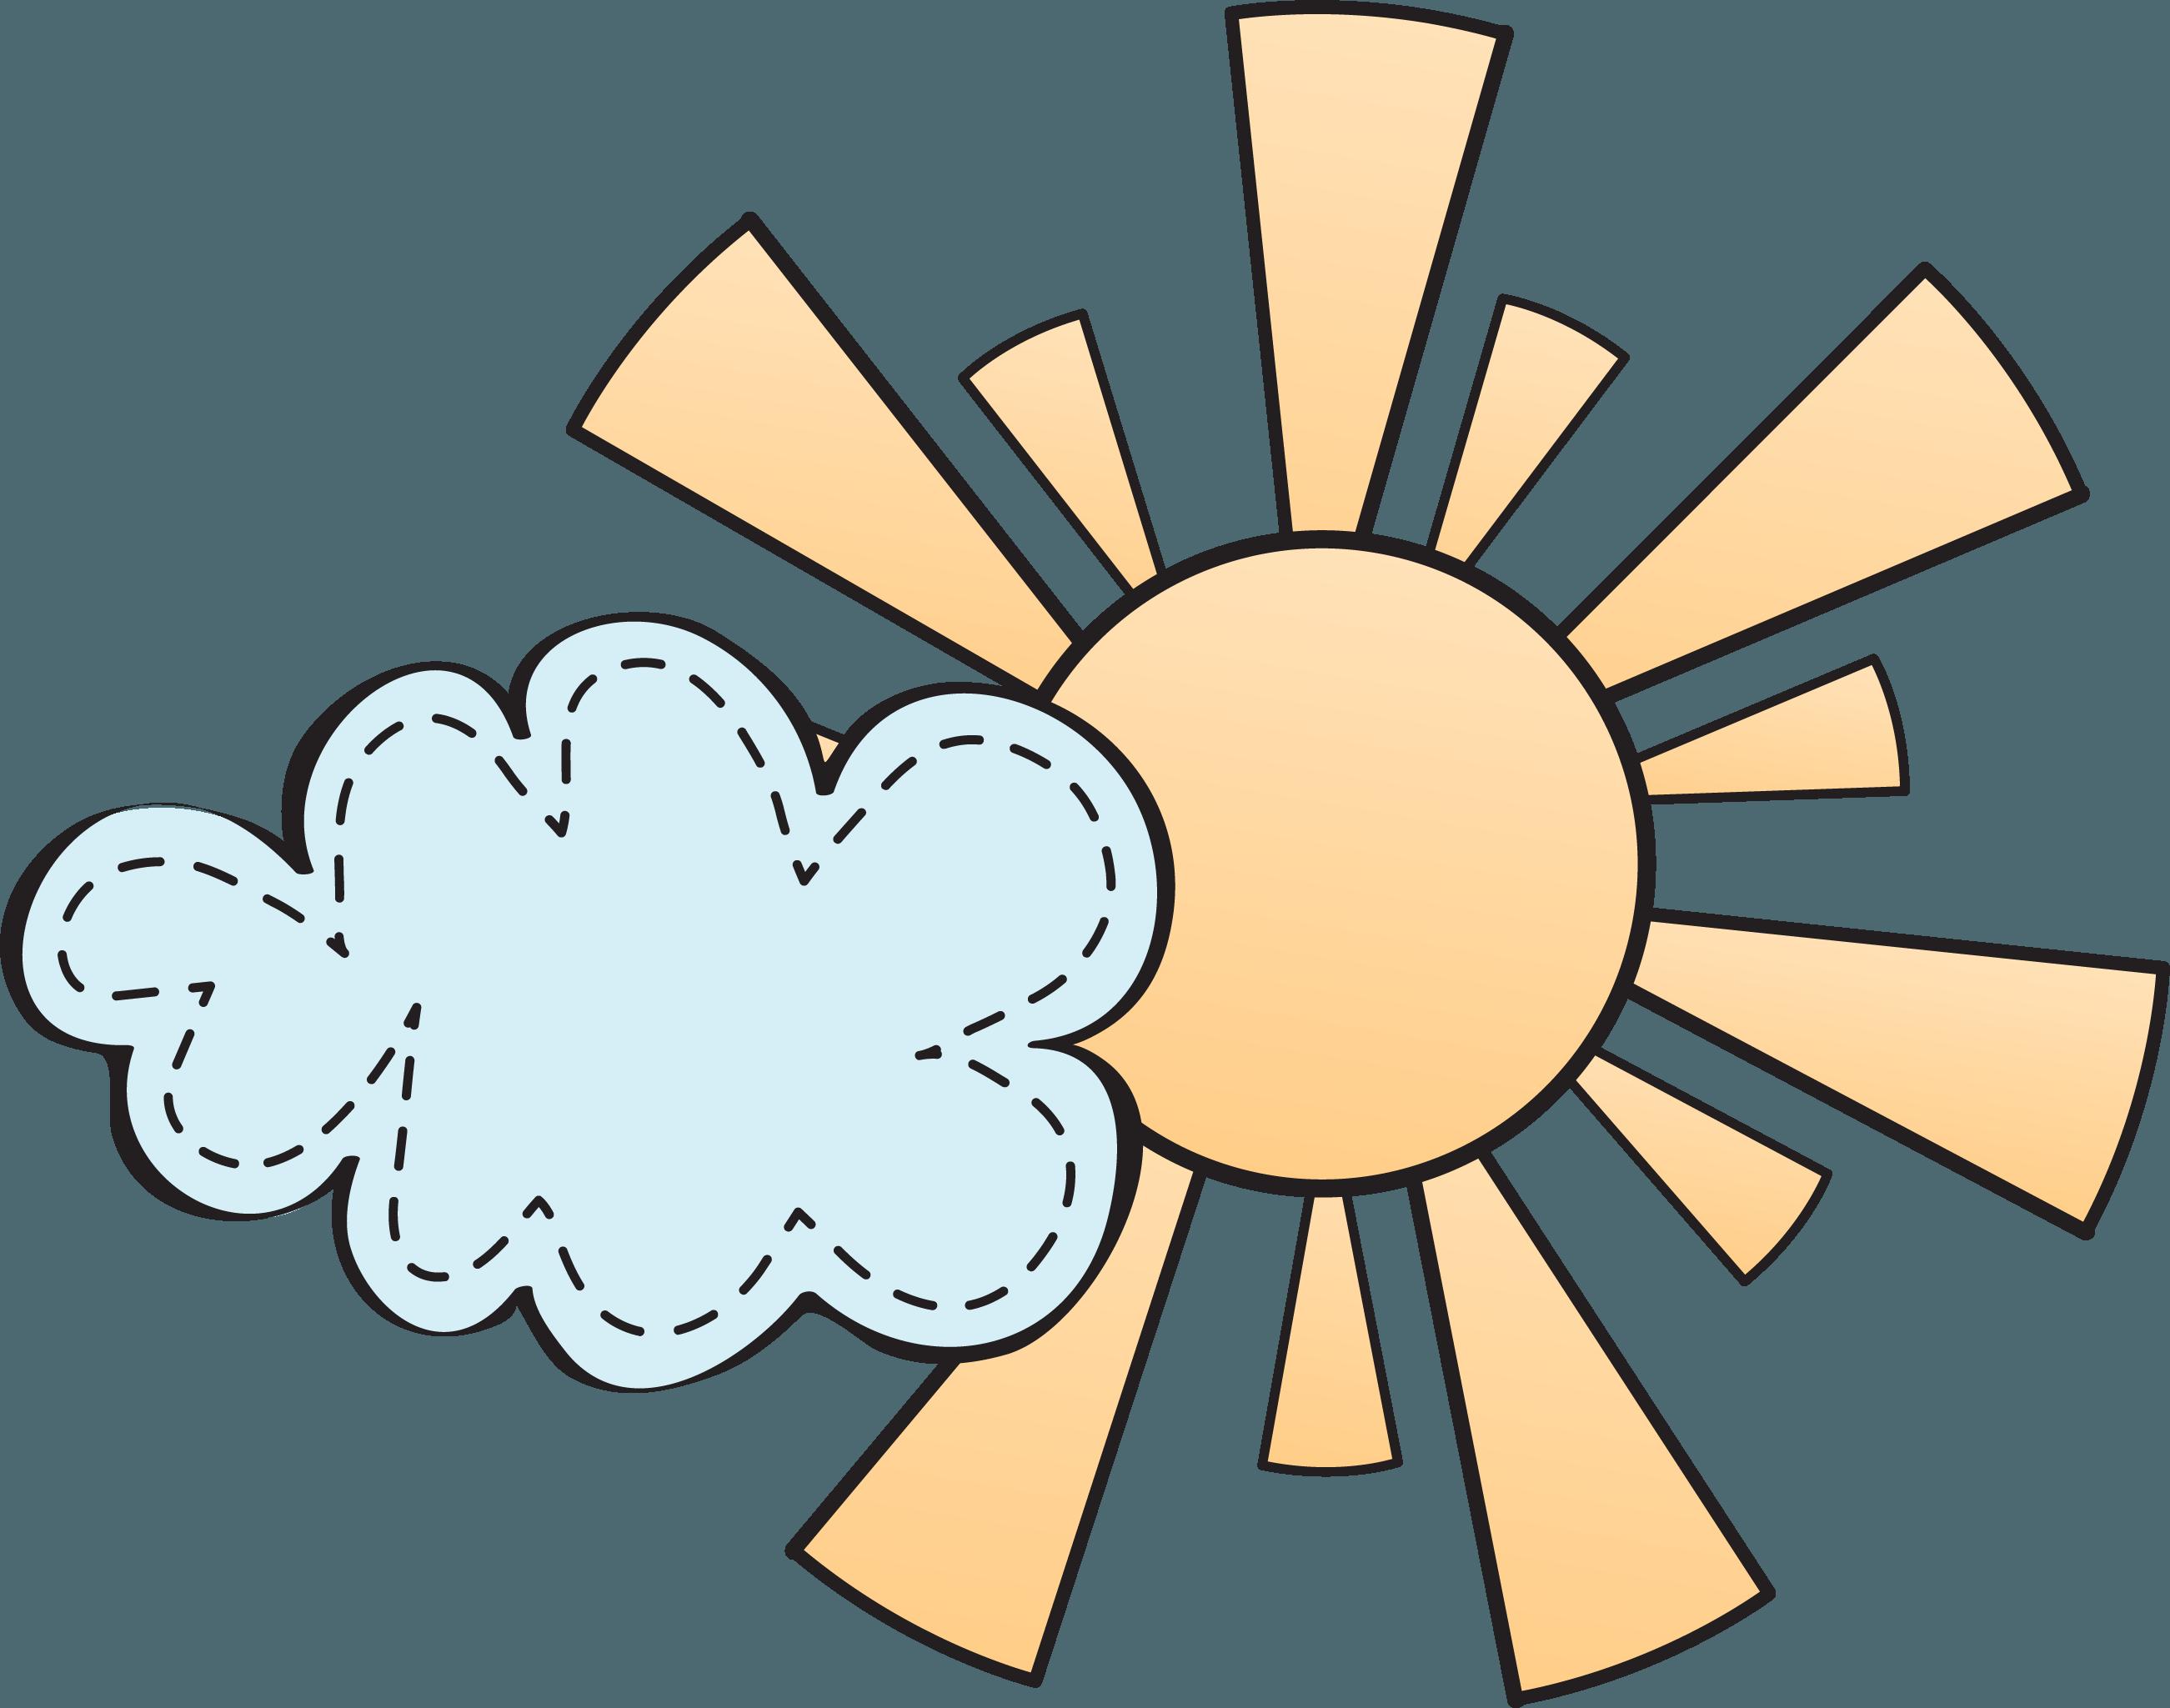 Sun clouds clipart png clip art free stock Blue ribbon Award Clip art - Cartoon sun cartoon clouds 2603*2049 ... clip art free stock